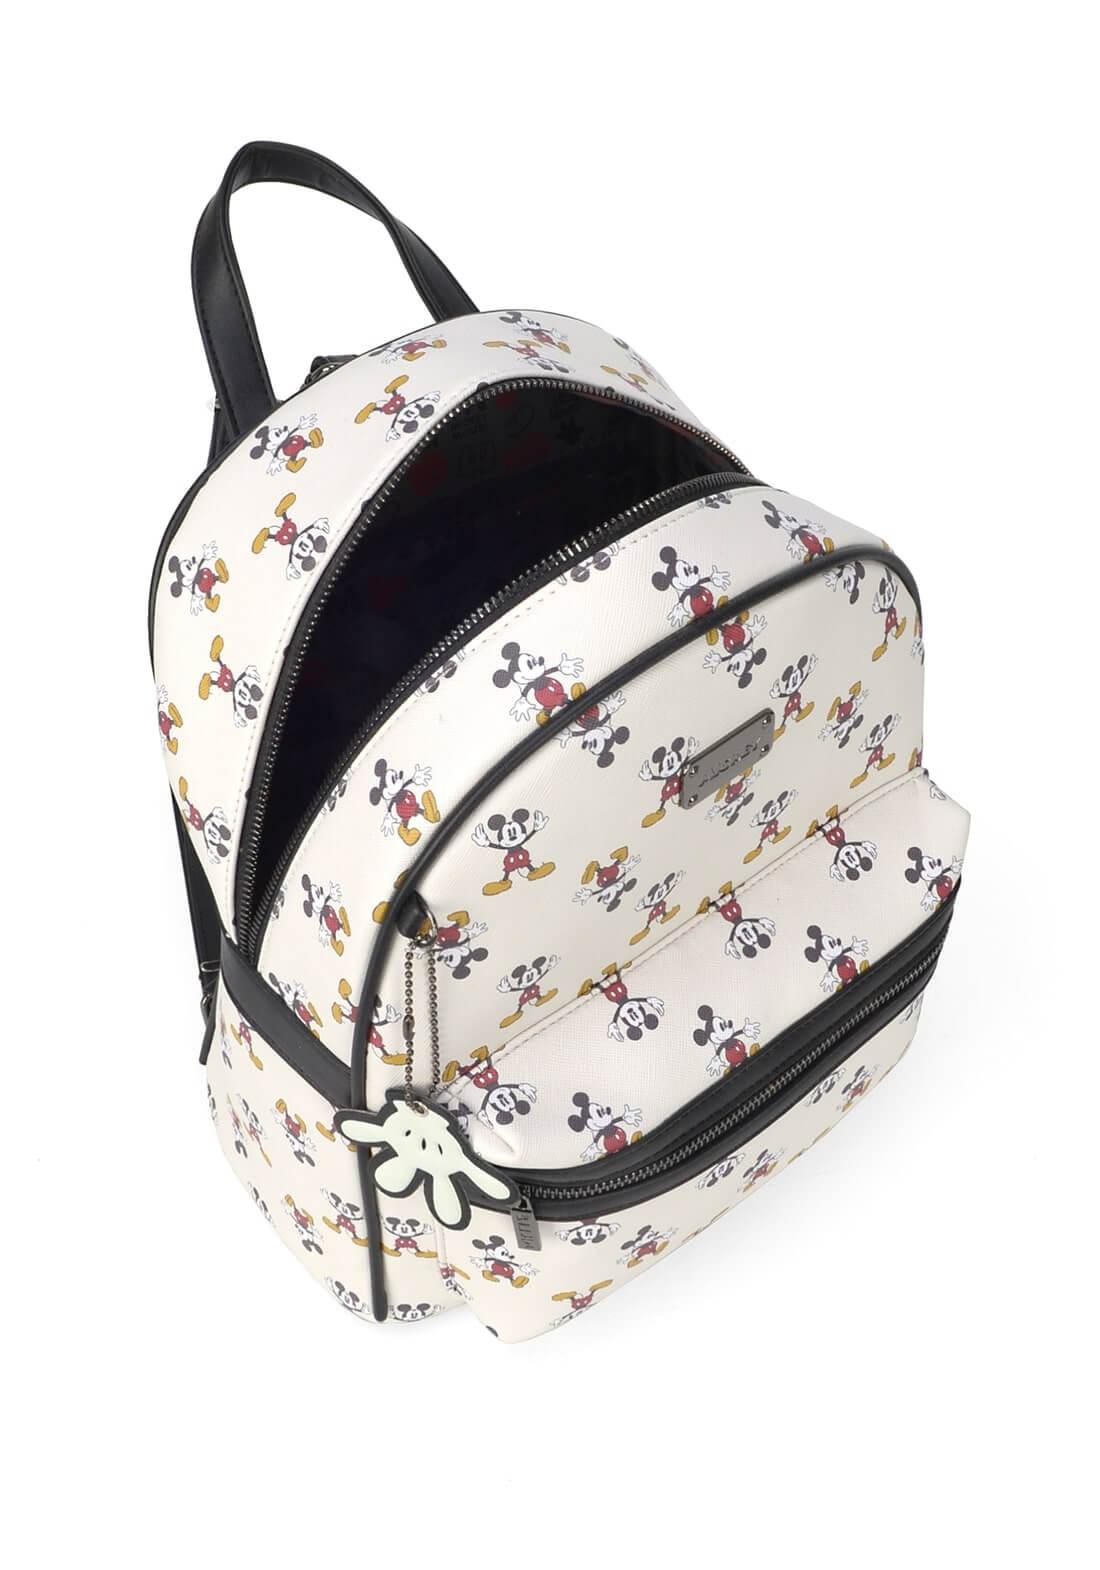 Bolsa Mochila Couro Sintético Mickey Mouse Branca Original